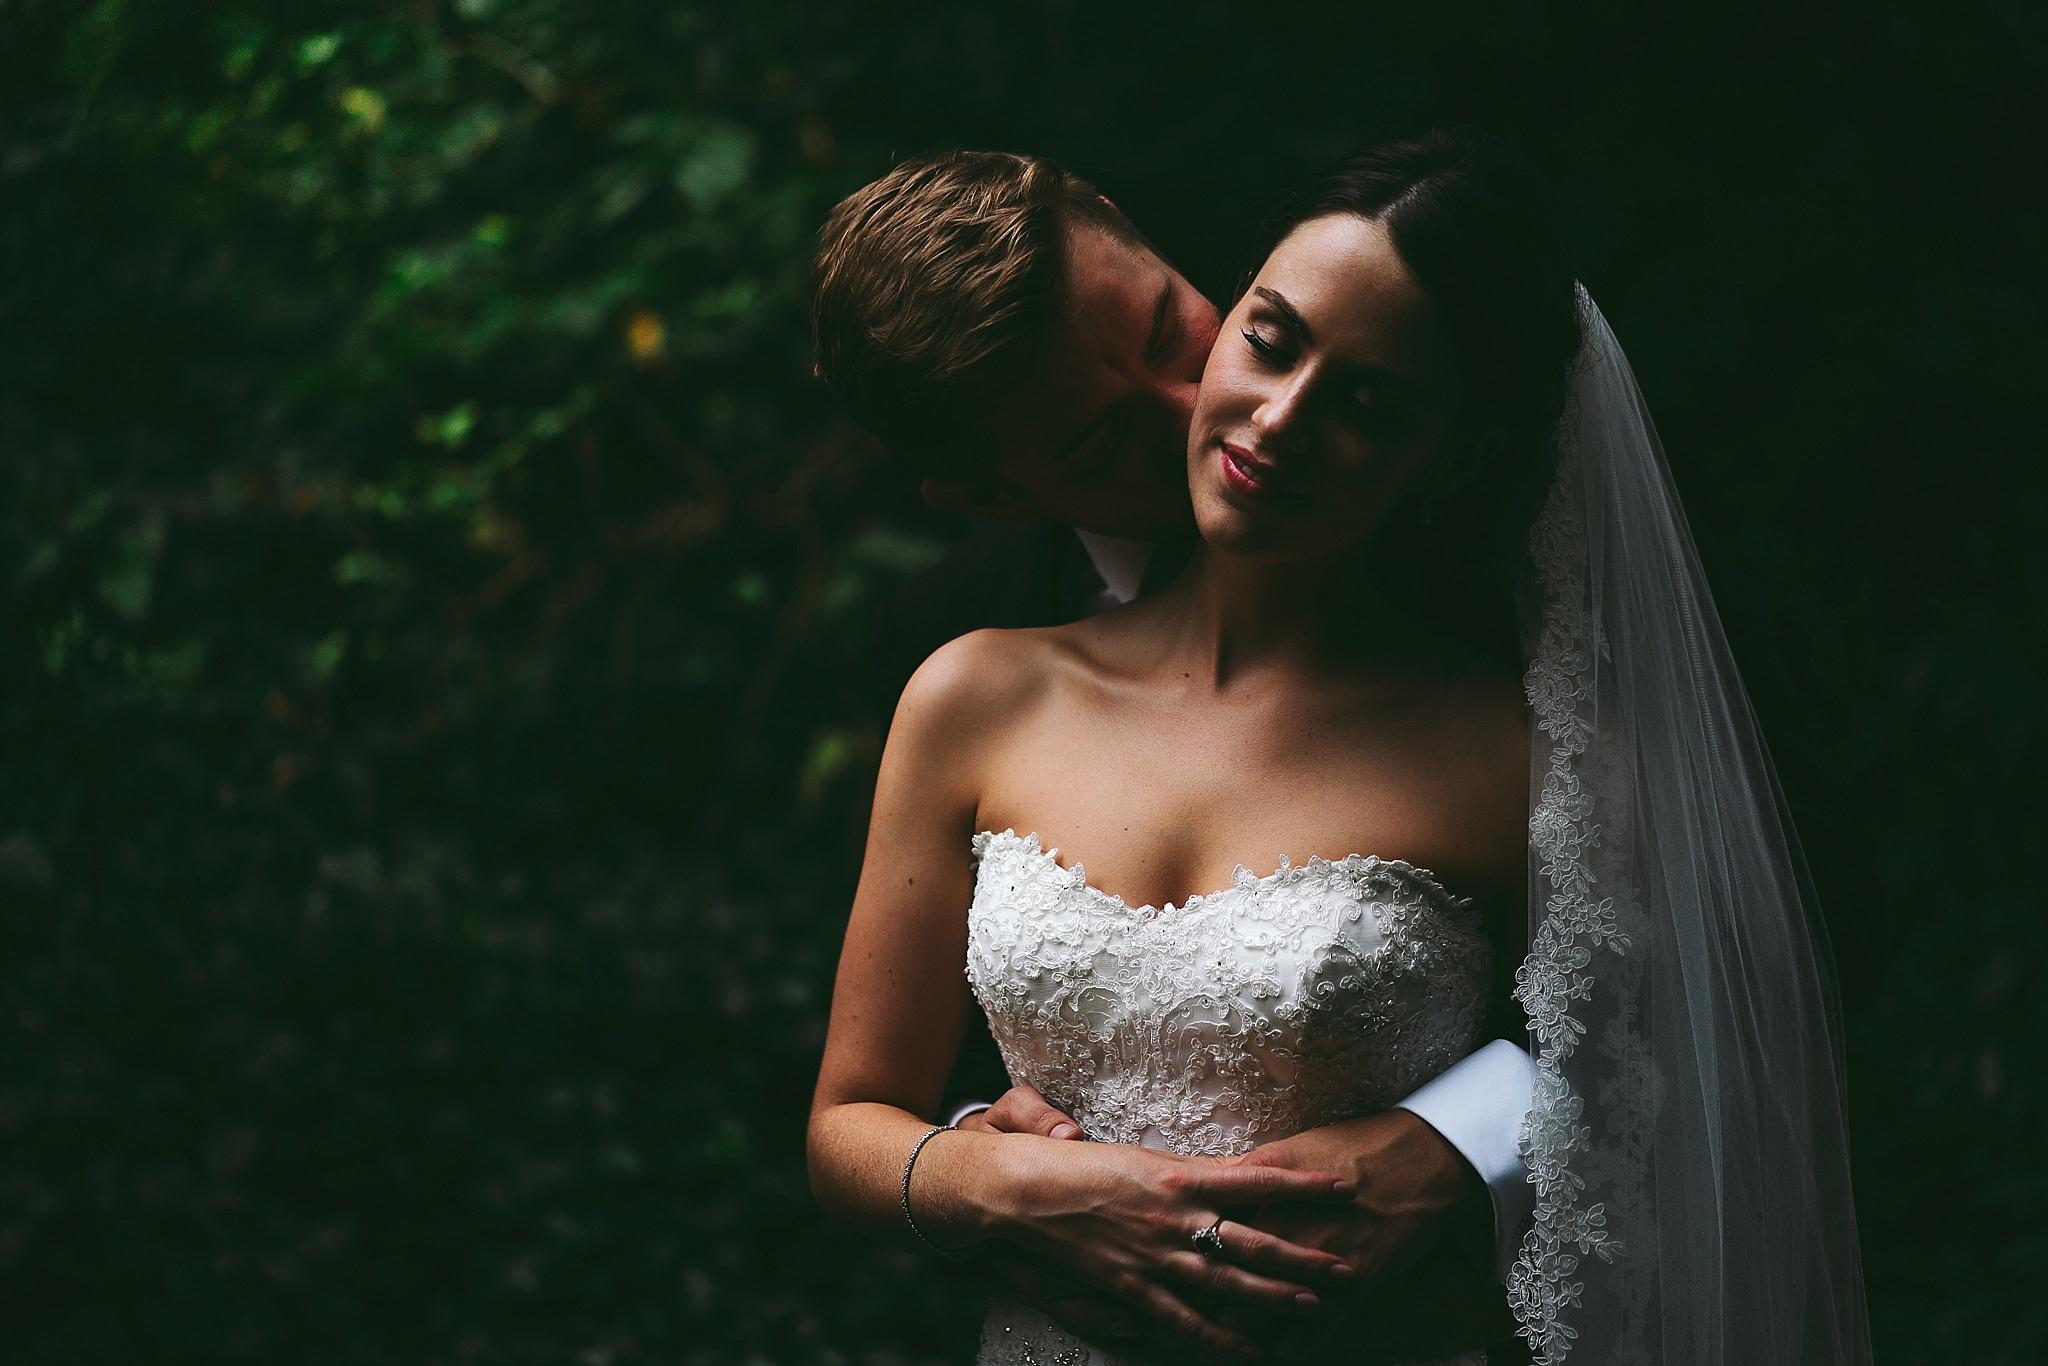 aga-tomaszek-wedding-photographer-cardiff-2016_1105